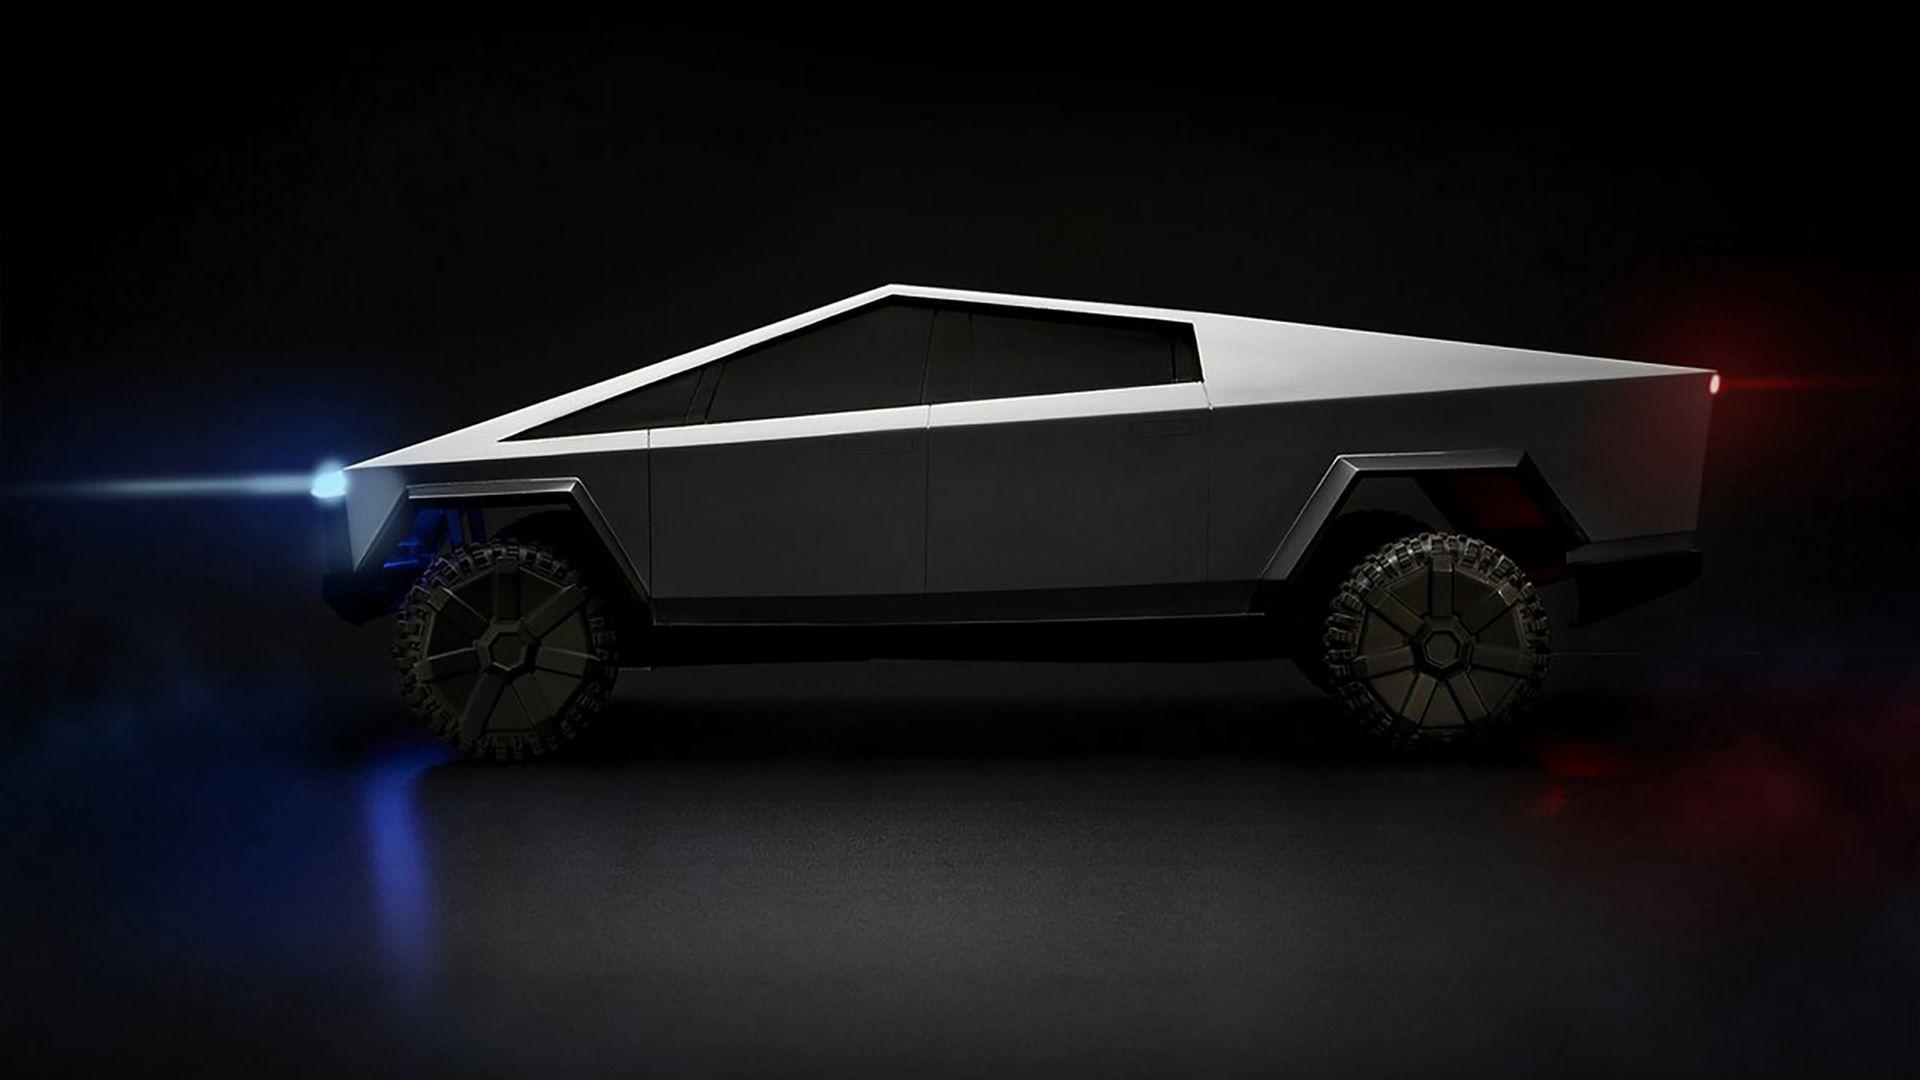 Hot-Wheels-RC-Tesla-Cybertruck-14